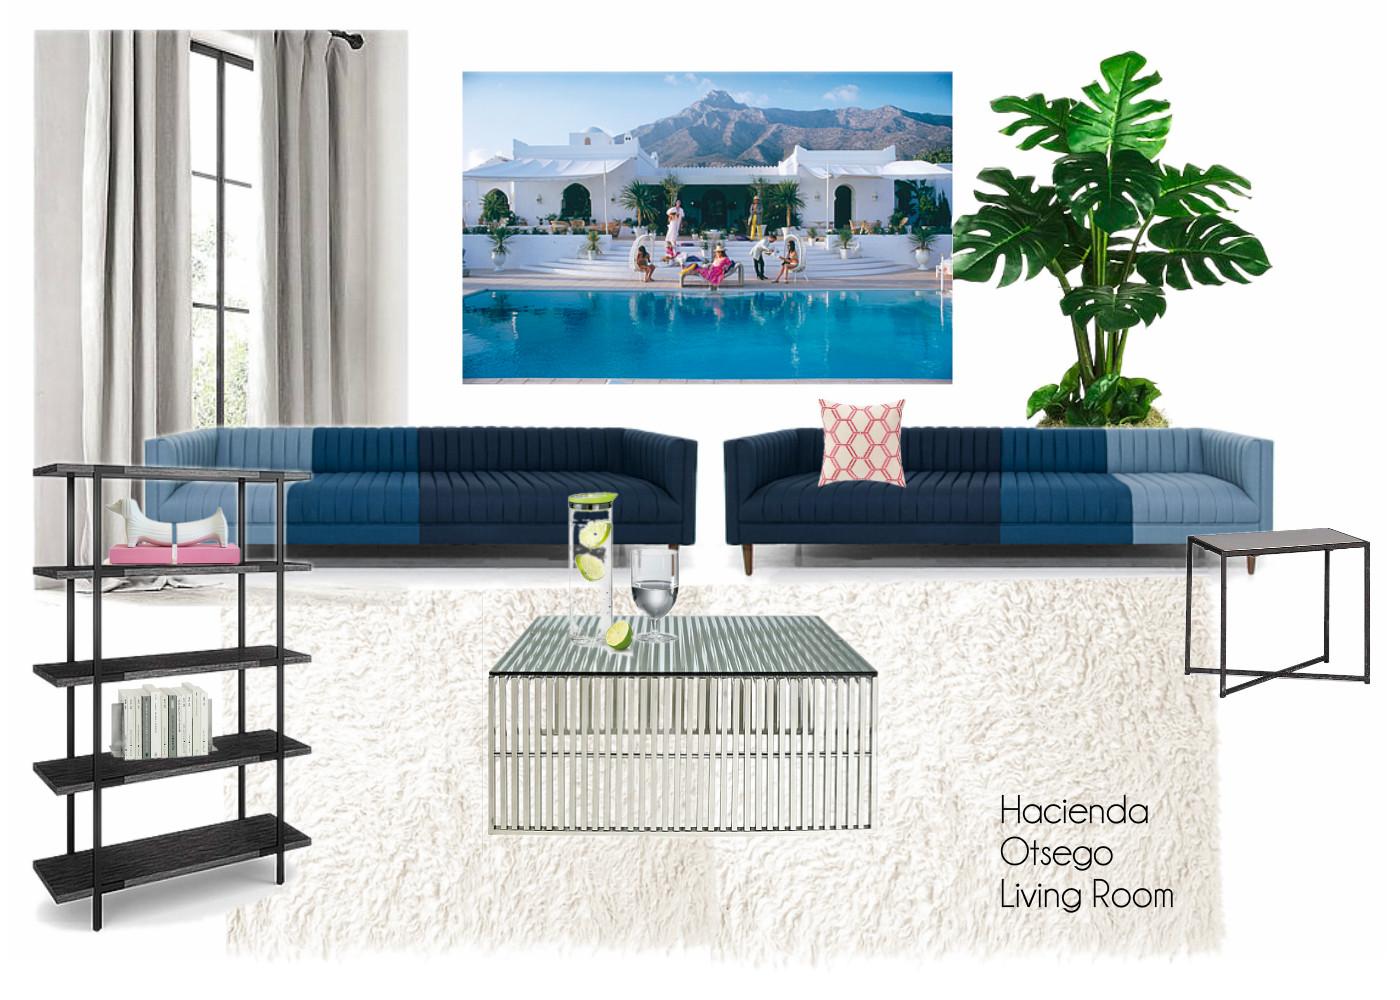 OB-Hacienda Otsega Living Room V.jpg